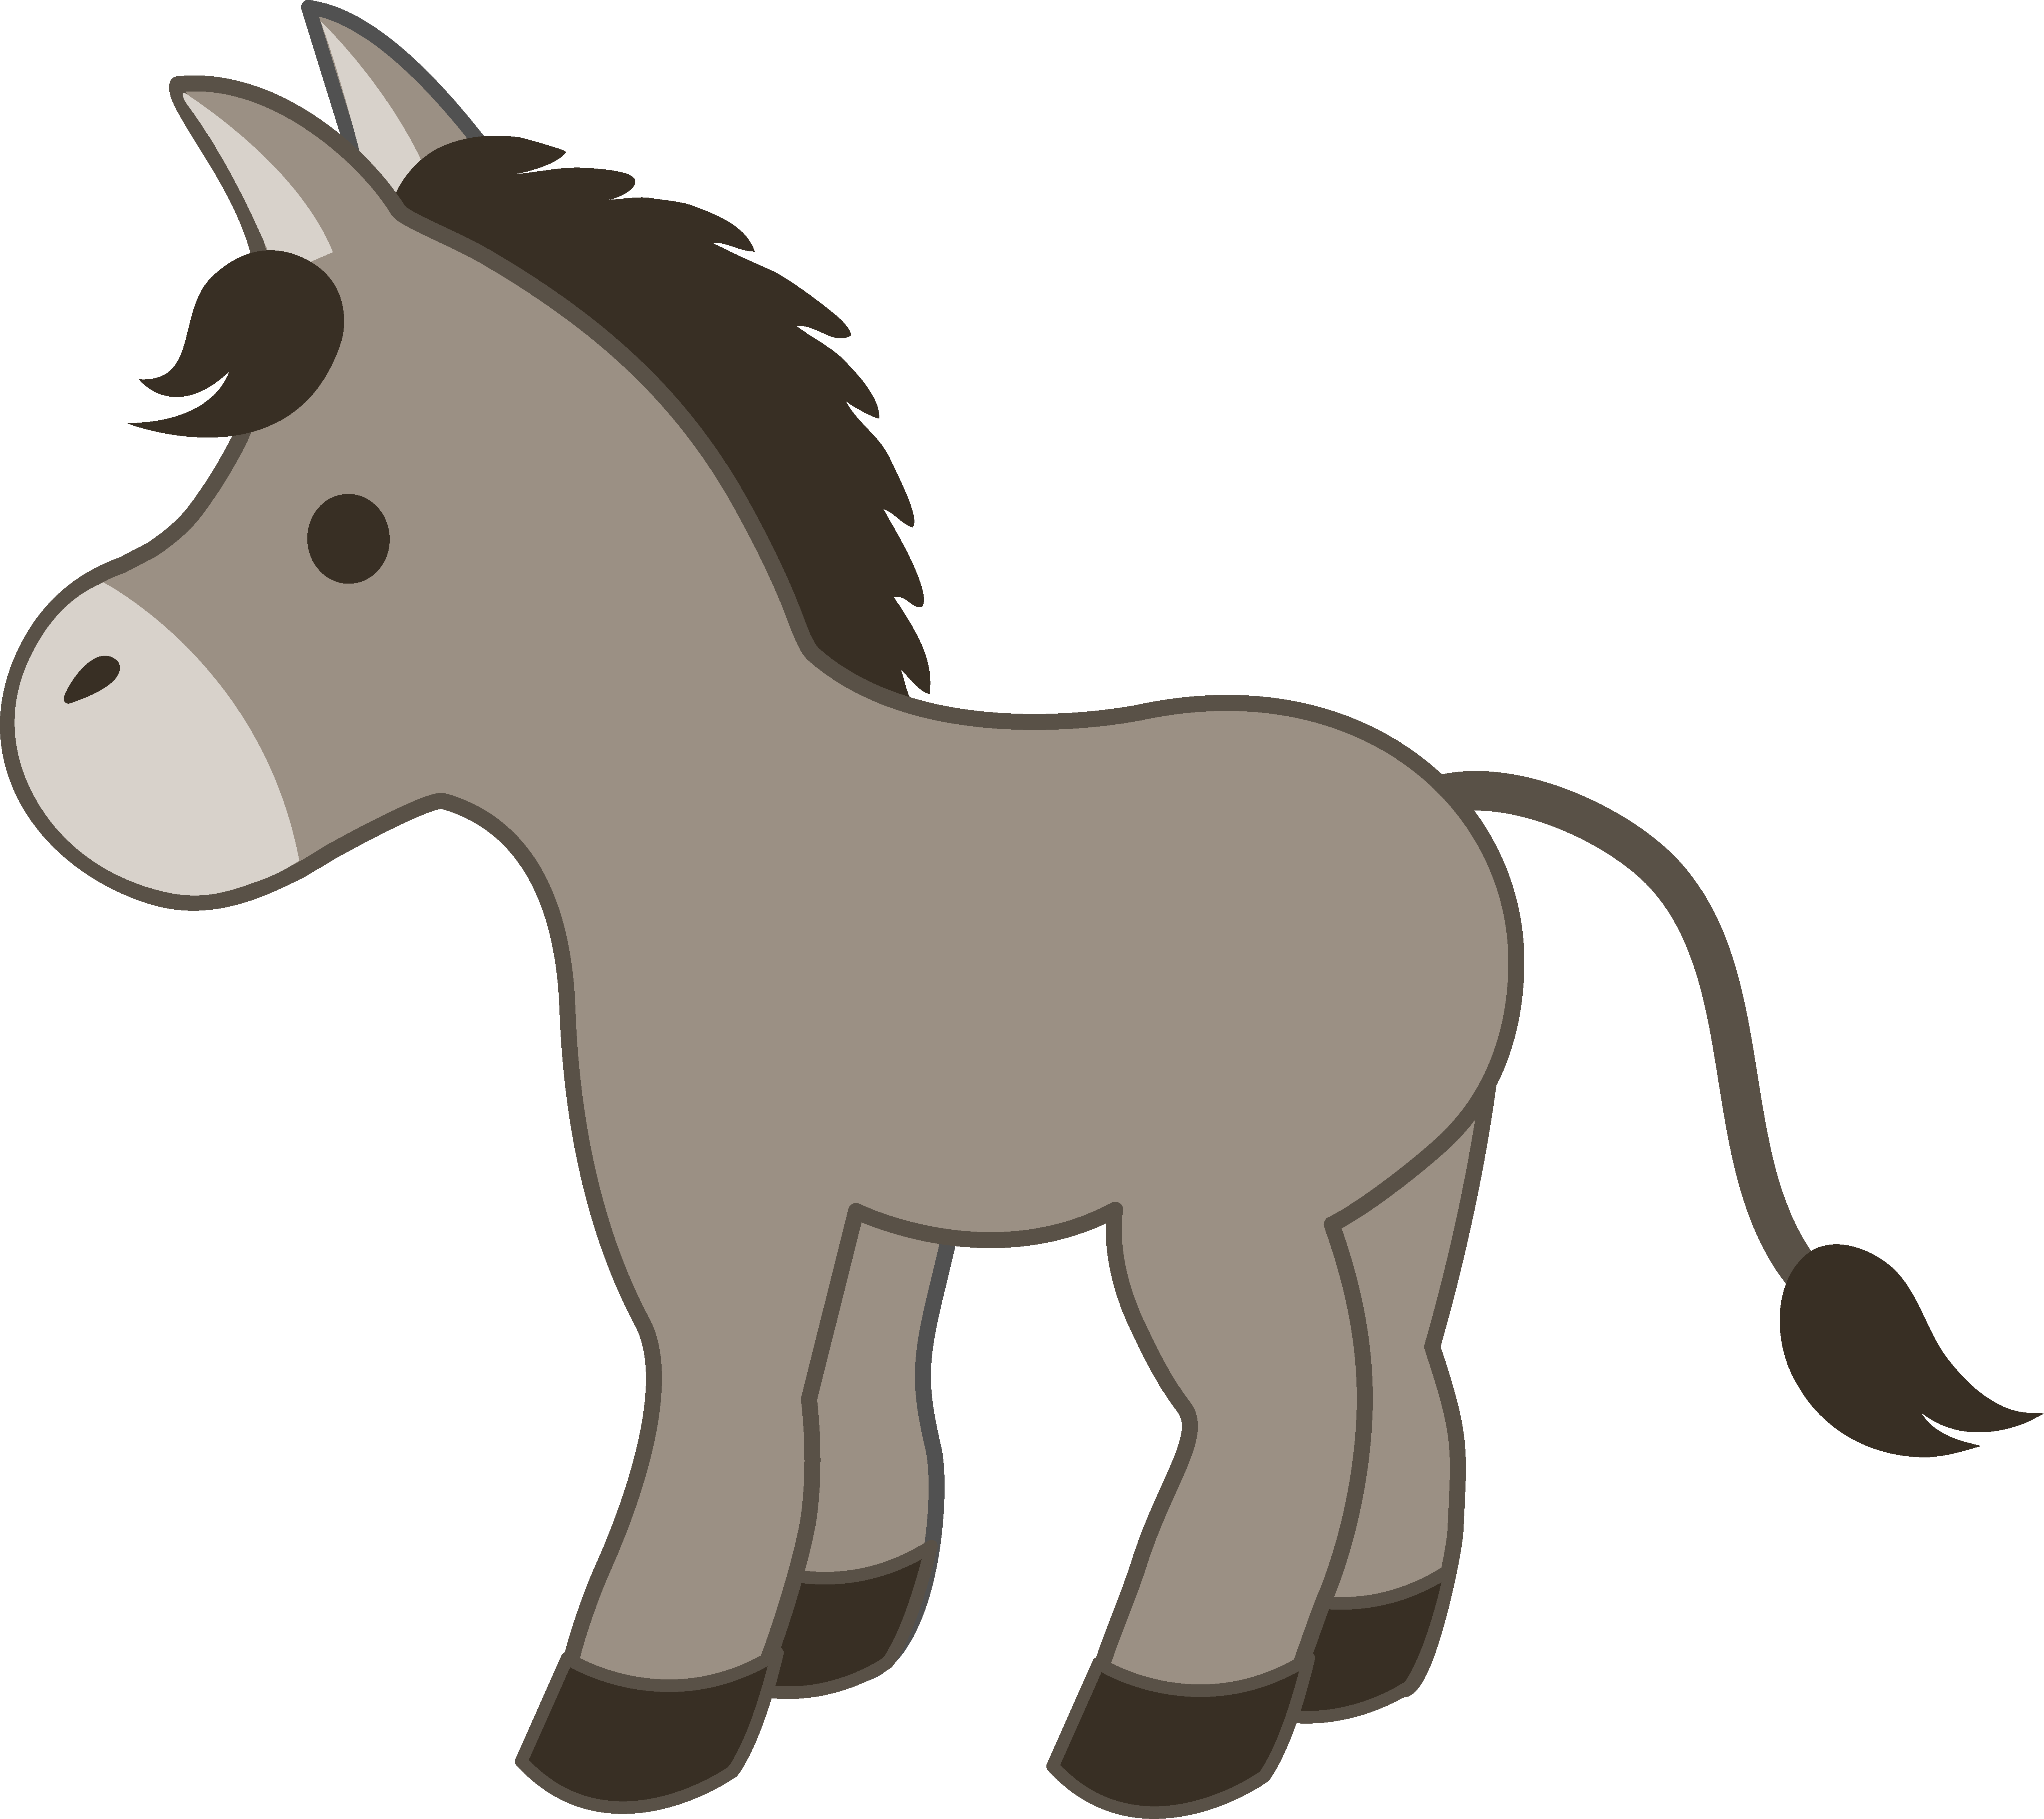 vector freeuse library Nativity clipart donkey. D easyeng from httpsweetclipartcomcutegraydonkey.